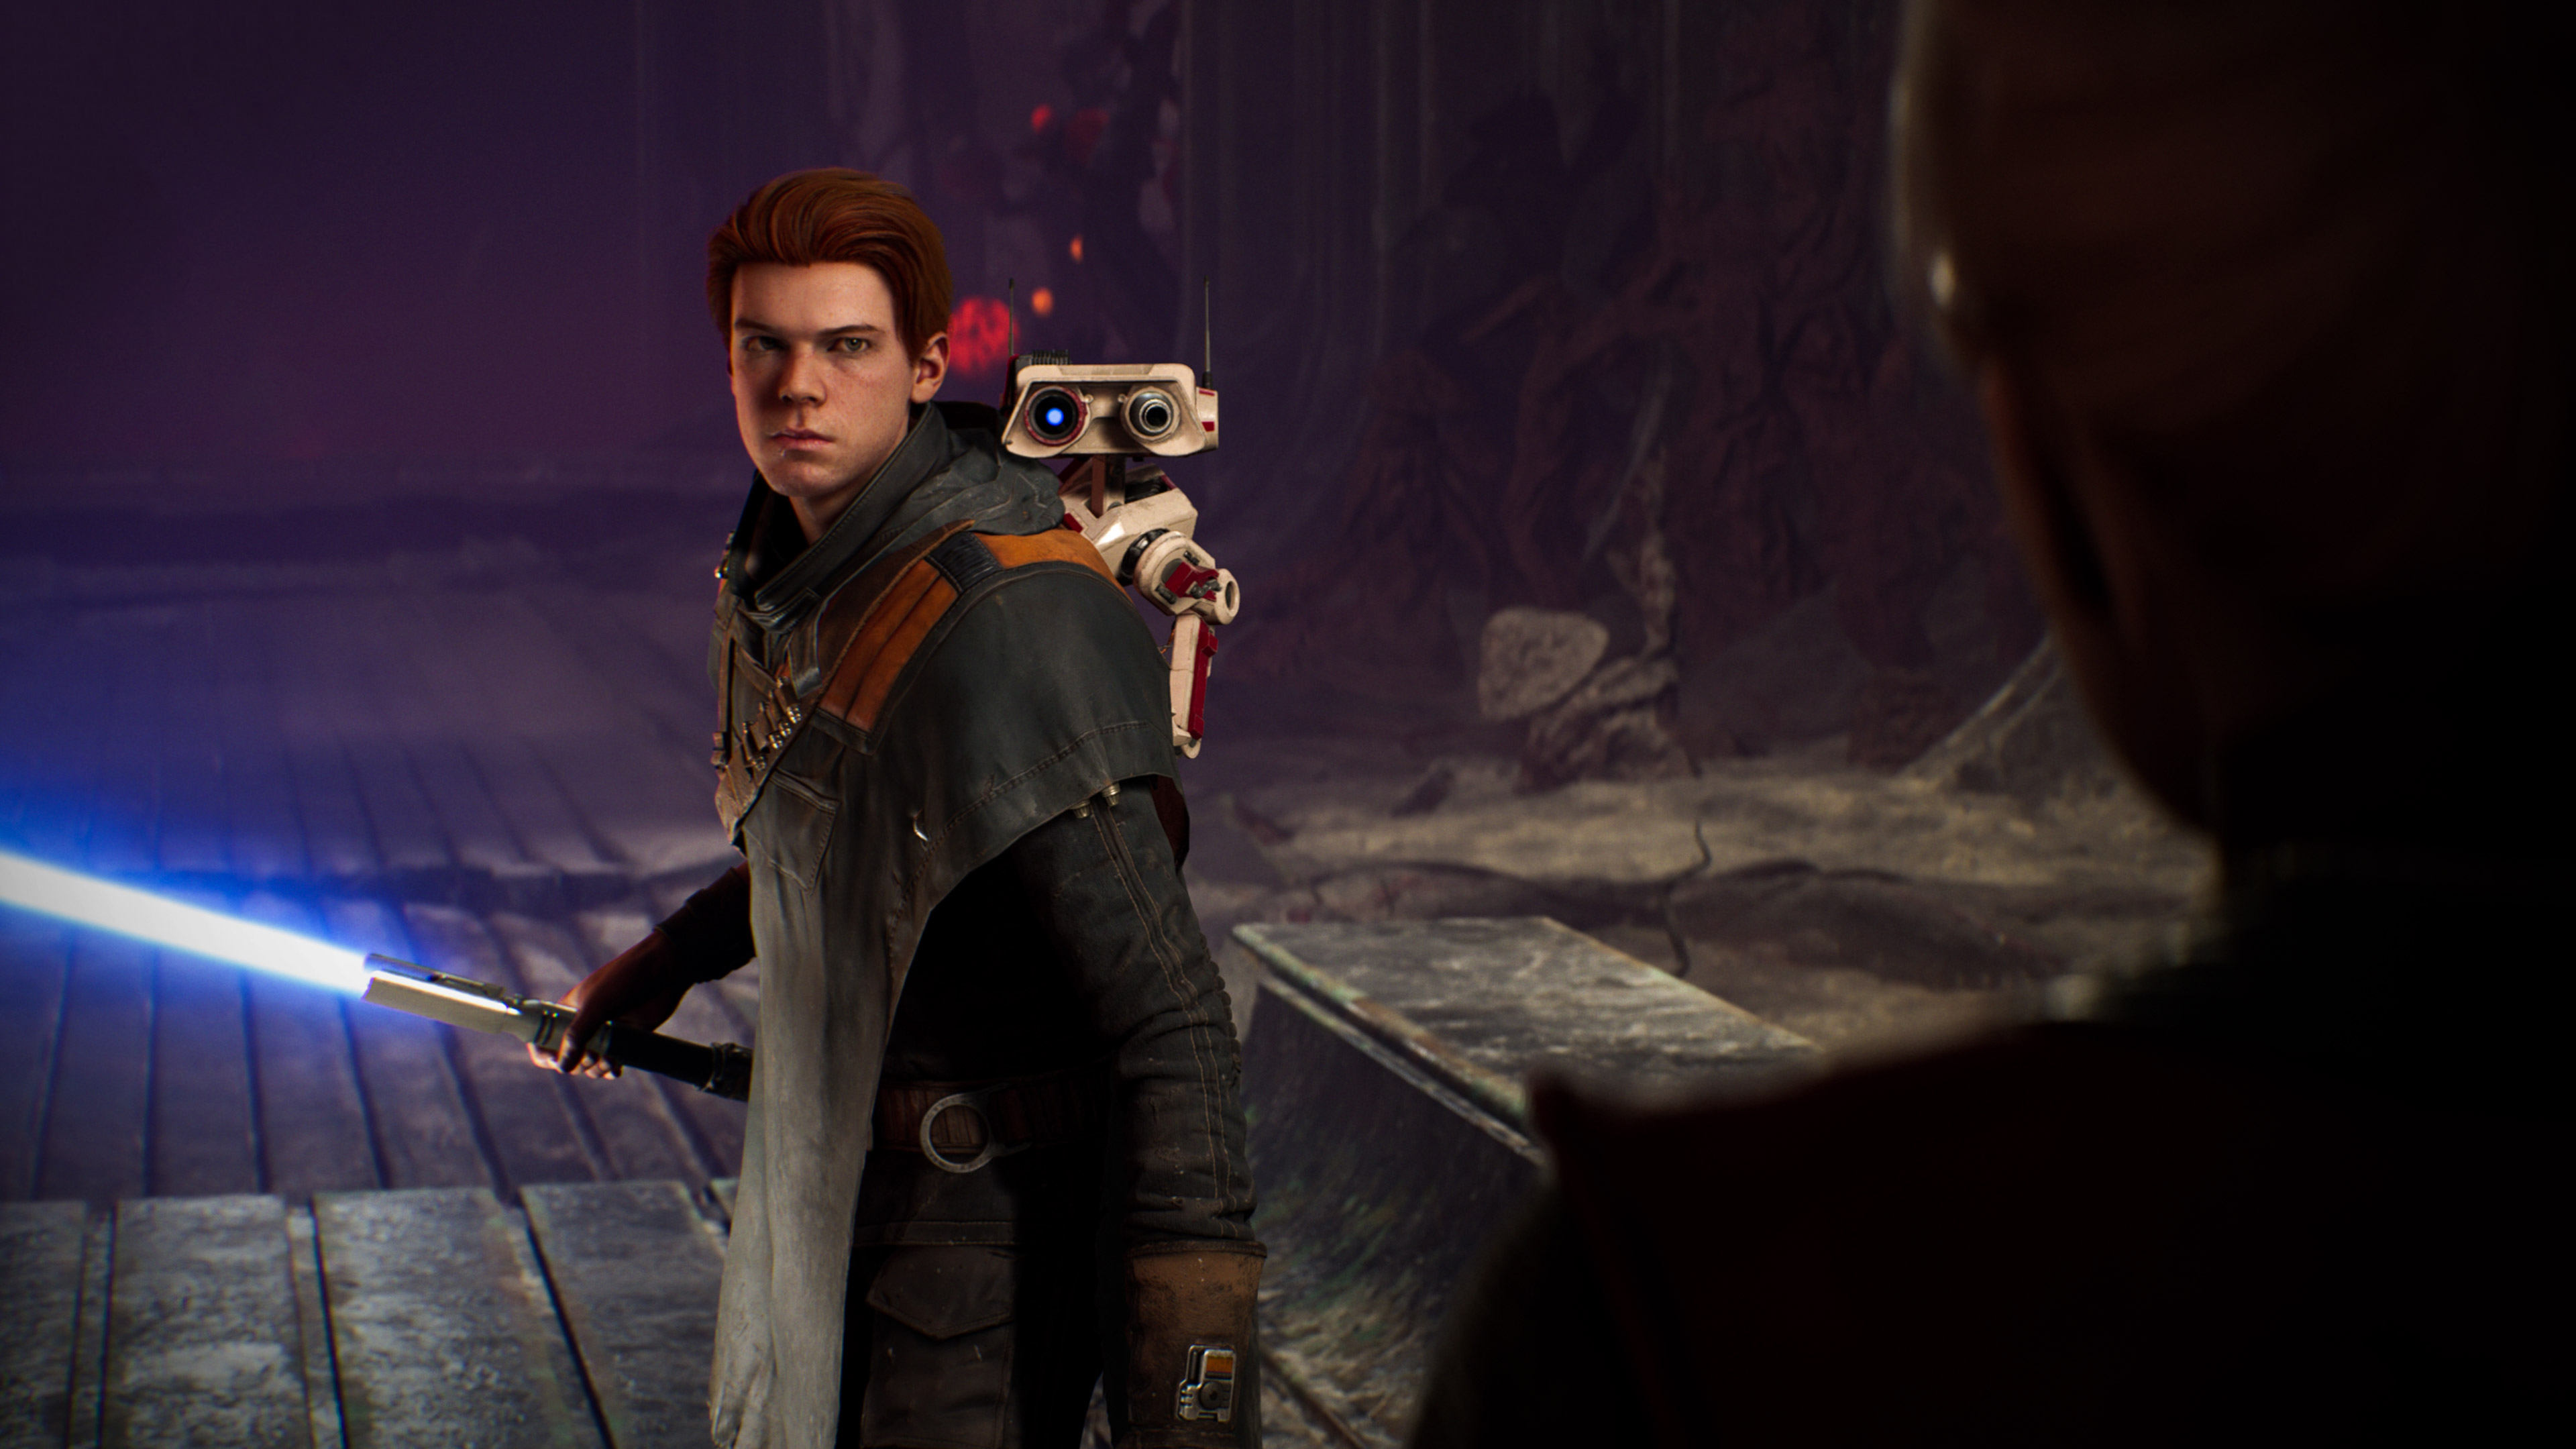 Star Wars Jedi: Fallen Order beginner's guide